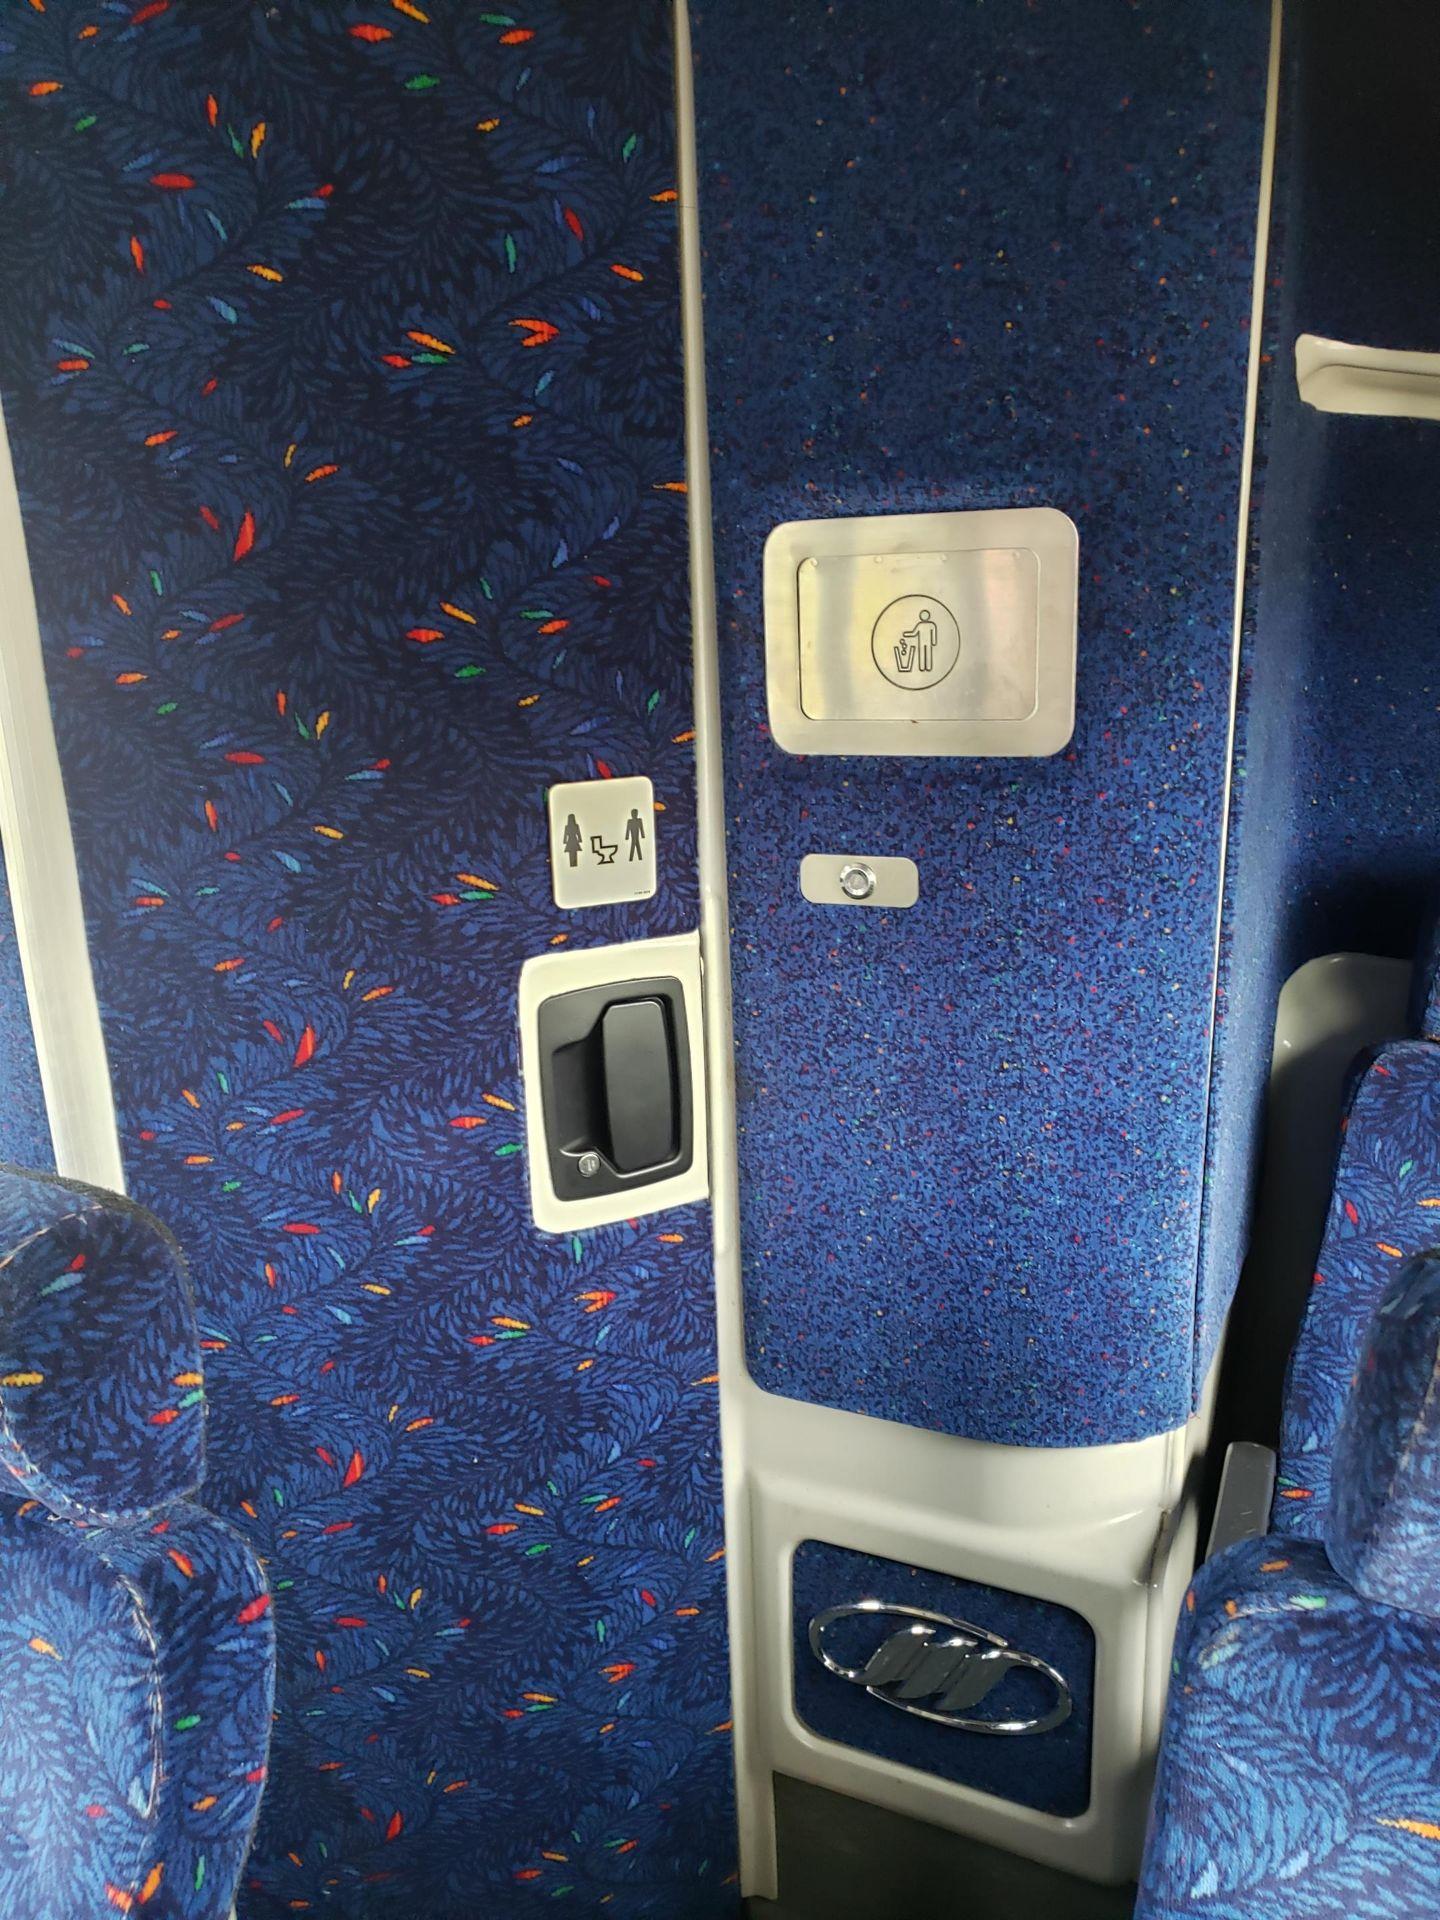 2005 MCI J4500 56-Pass Kneeling Coach Bus - Image 11 of 18